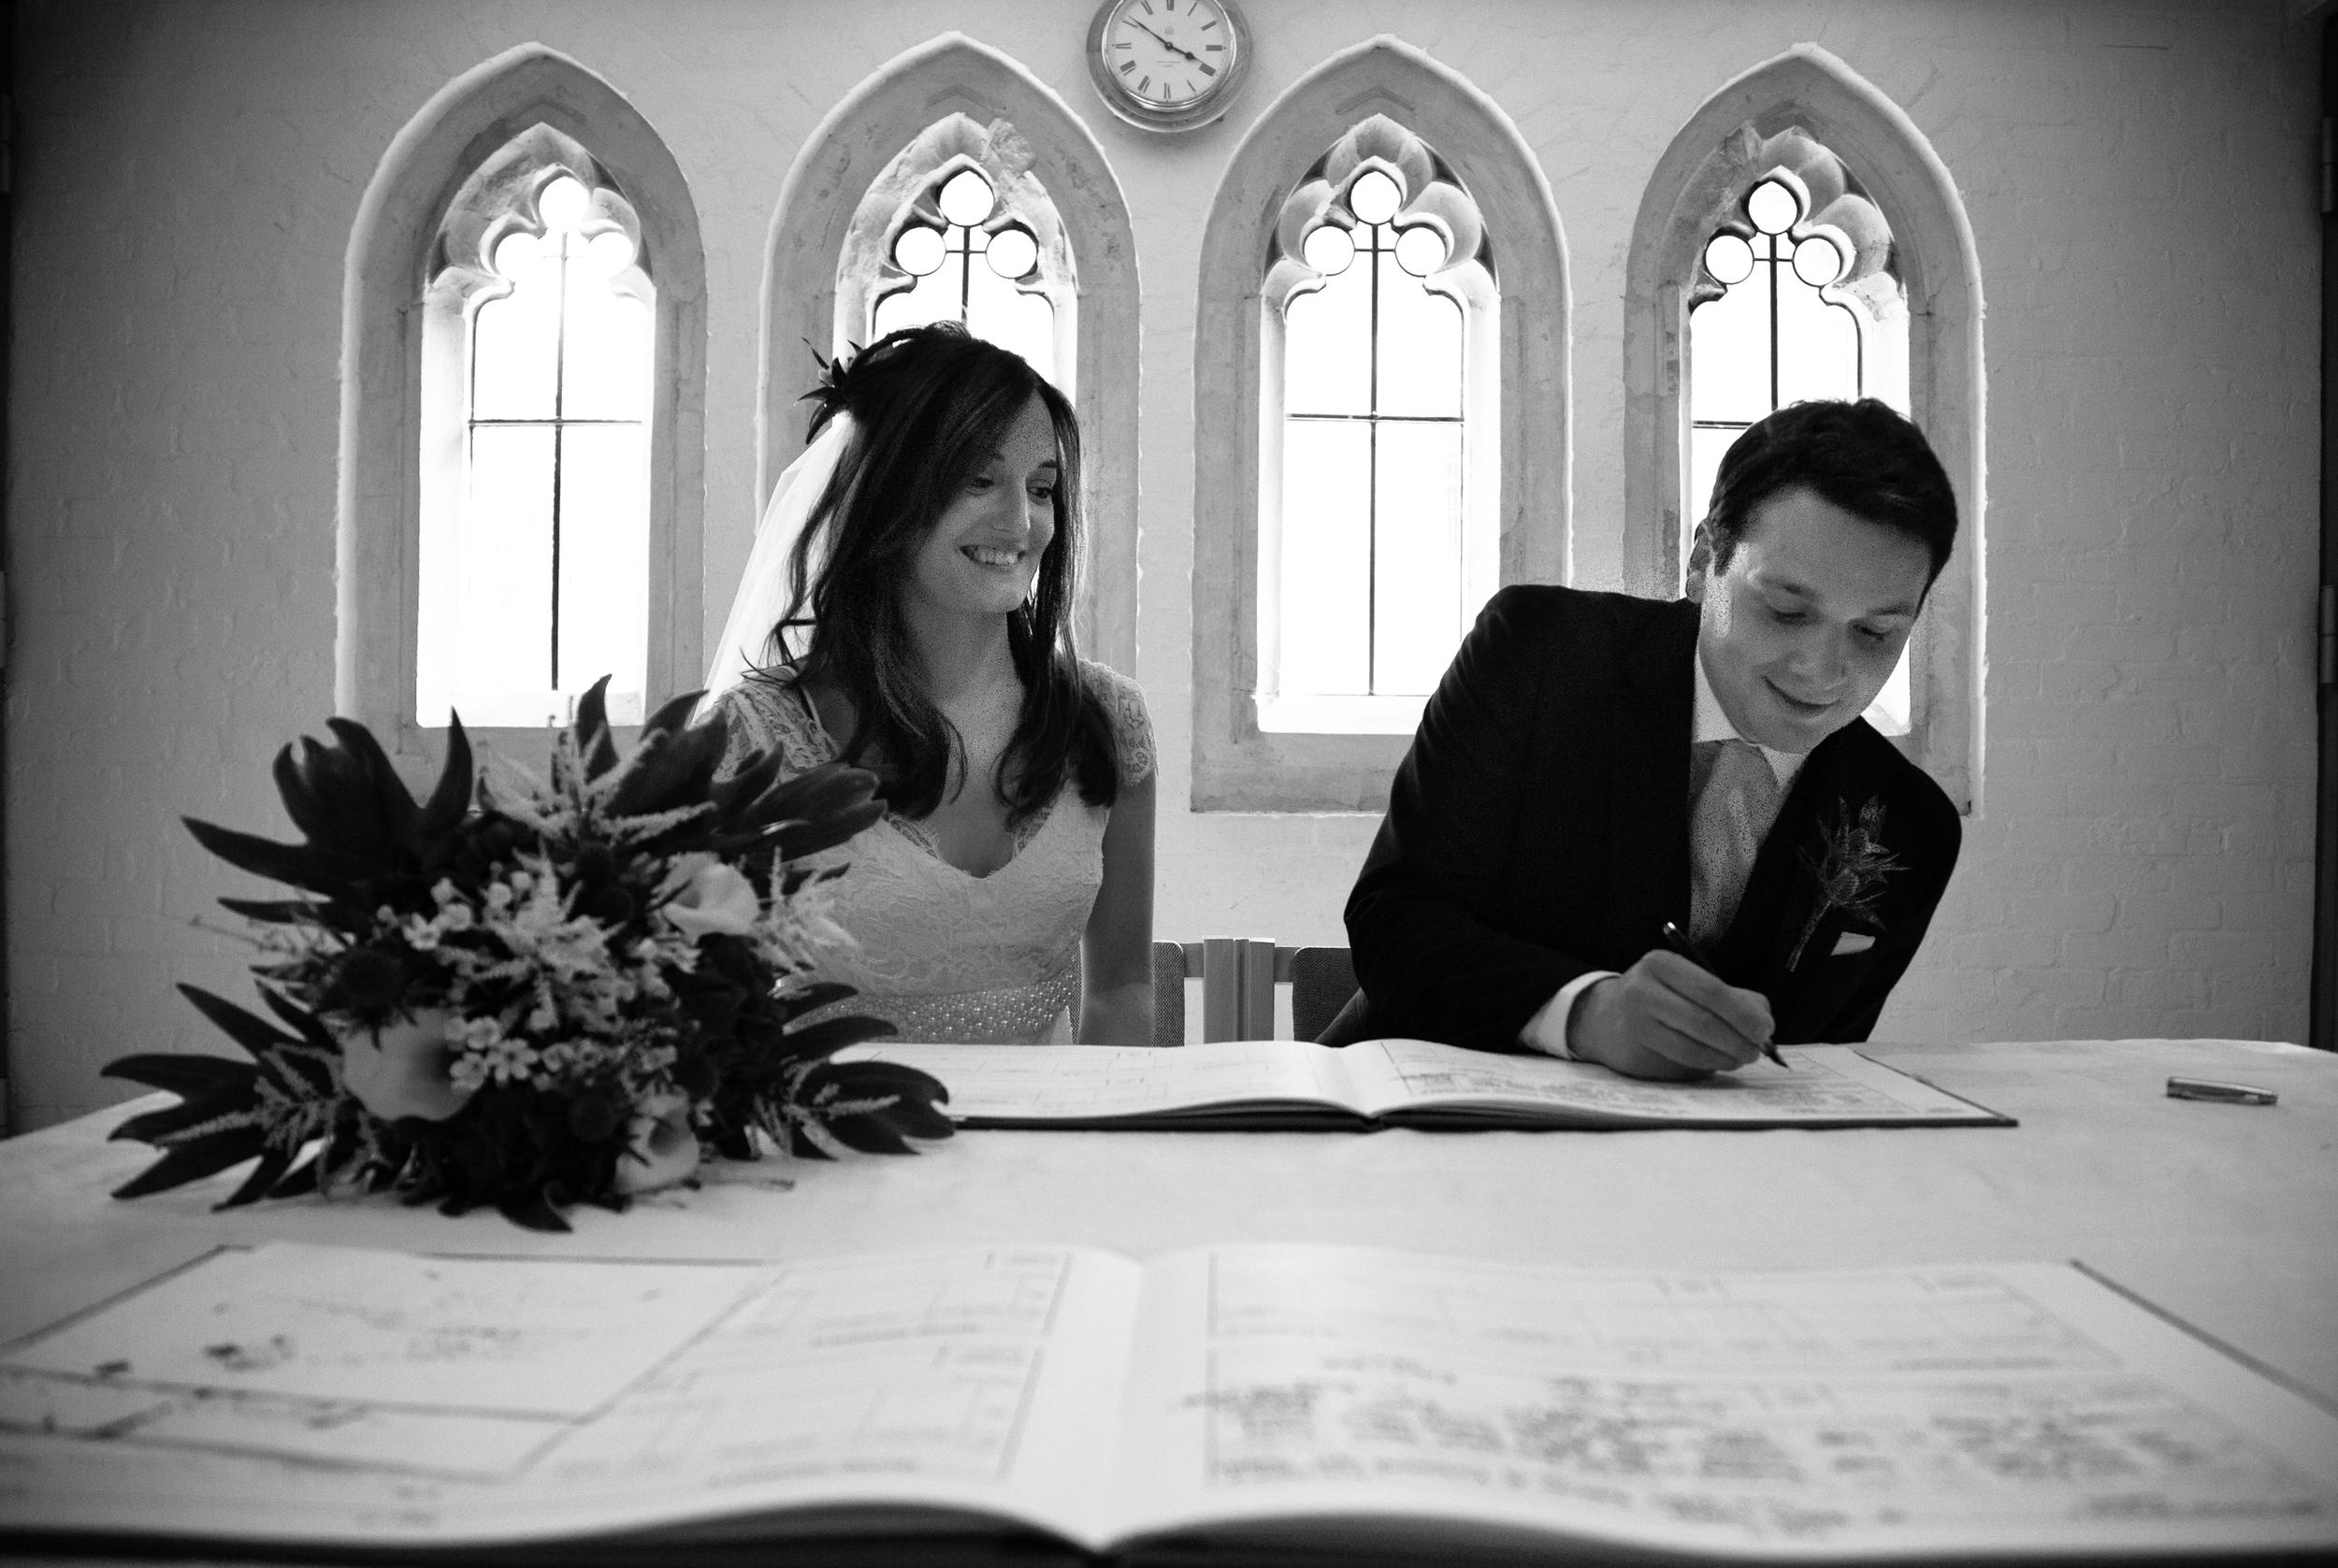 st-mary's-church-barnes-signing-register-london-uk-destination-wedding-photography-Adam-Rowley